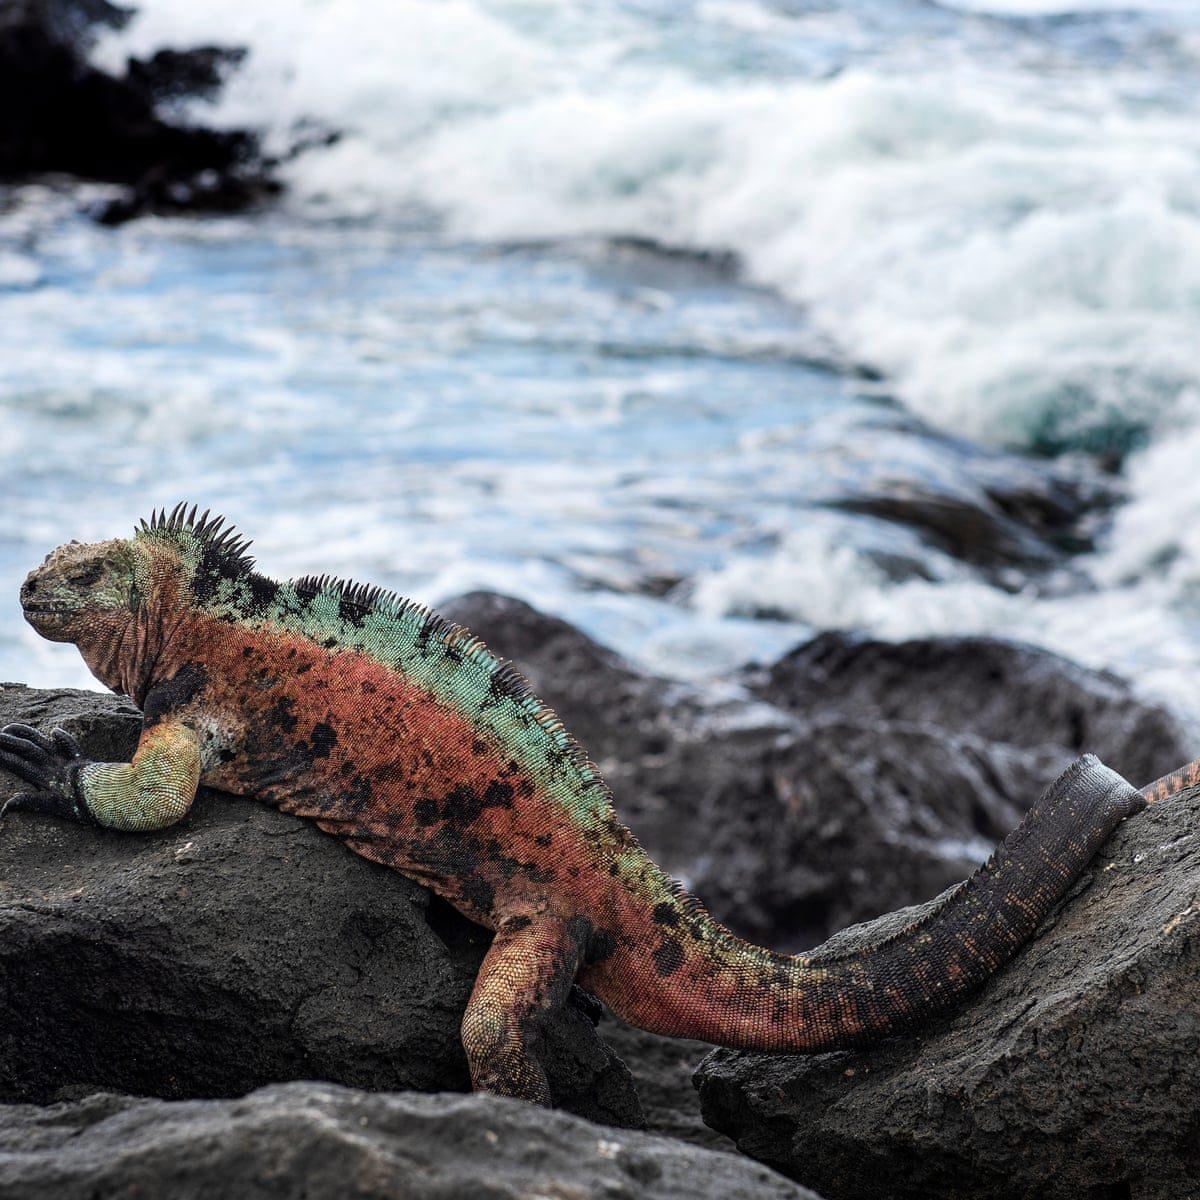 Leonardo DiCaprio Galapagos Islands re:wild pink iguana